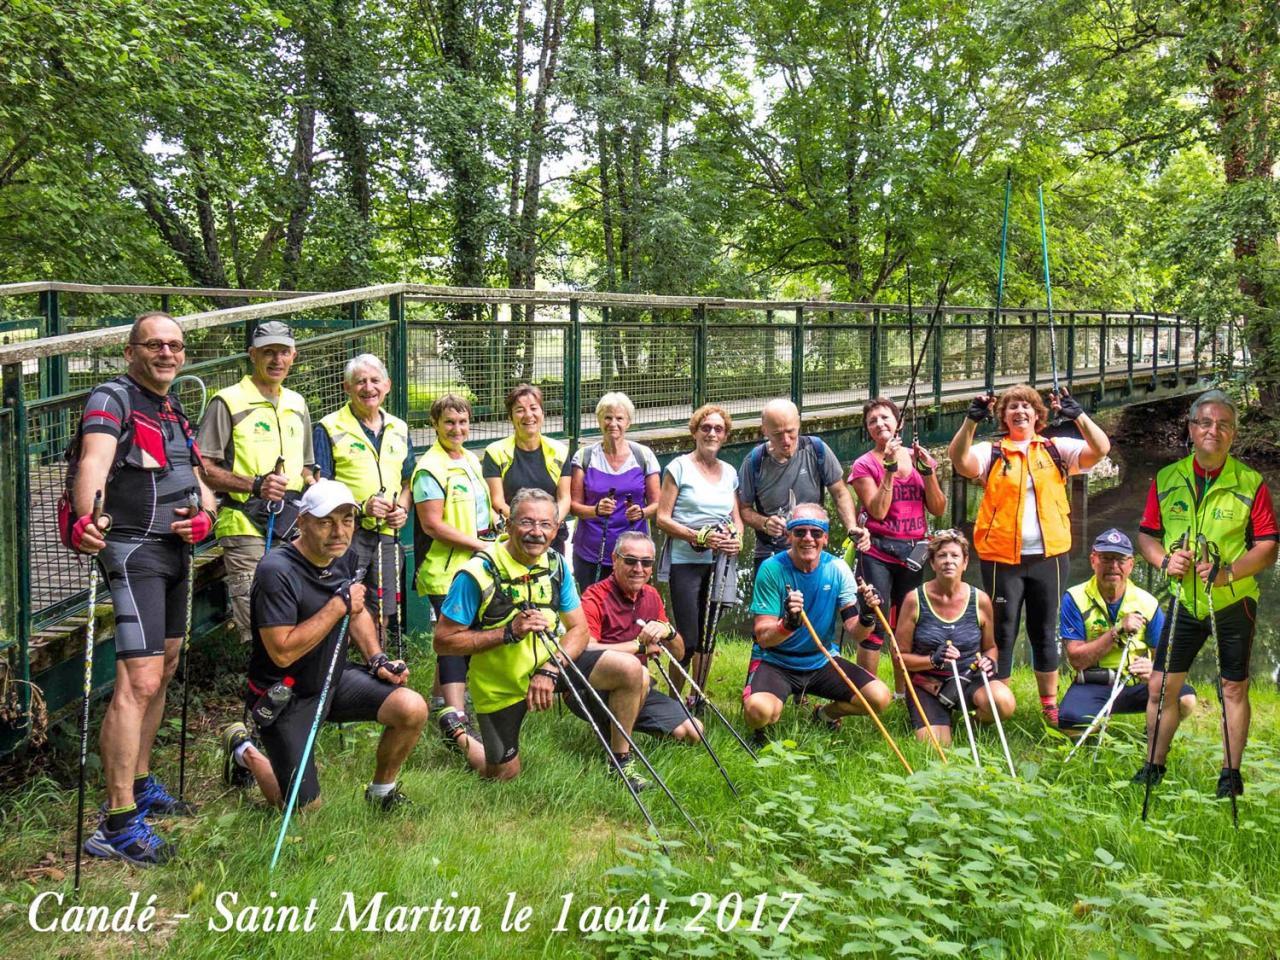 Cande Saint Martin 1 aout 2017